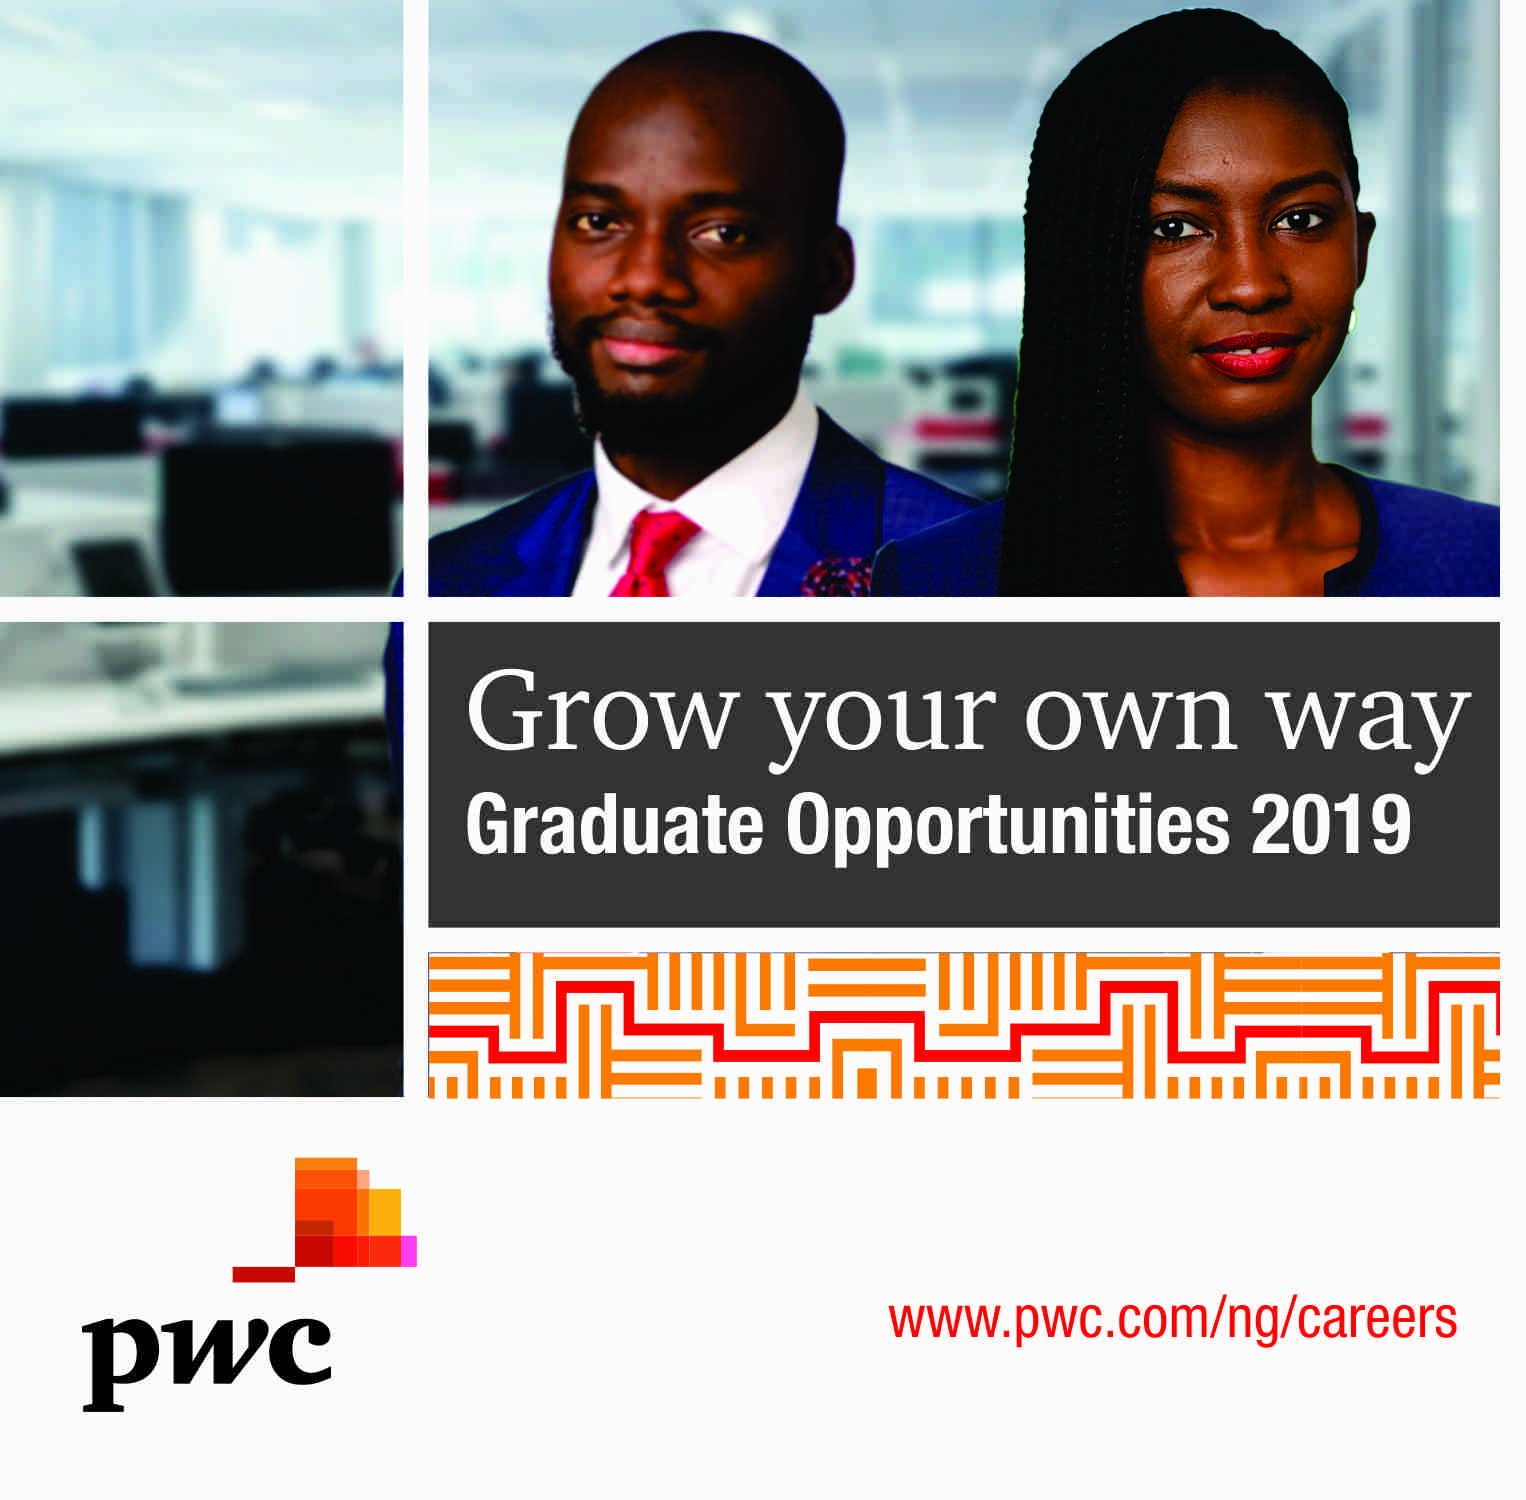 PricewaterhouseCooper (PwC) Nigeria Graduate Recruitment 2019 for young Nigerians